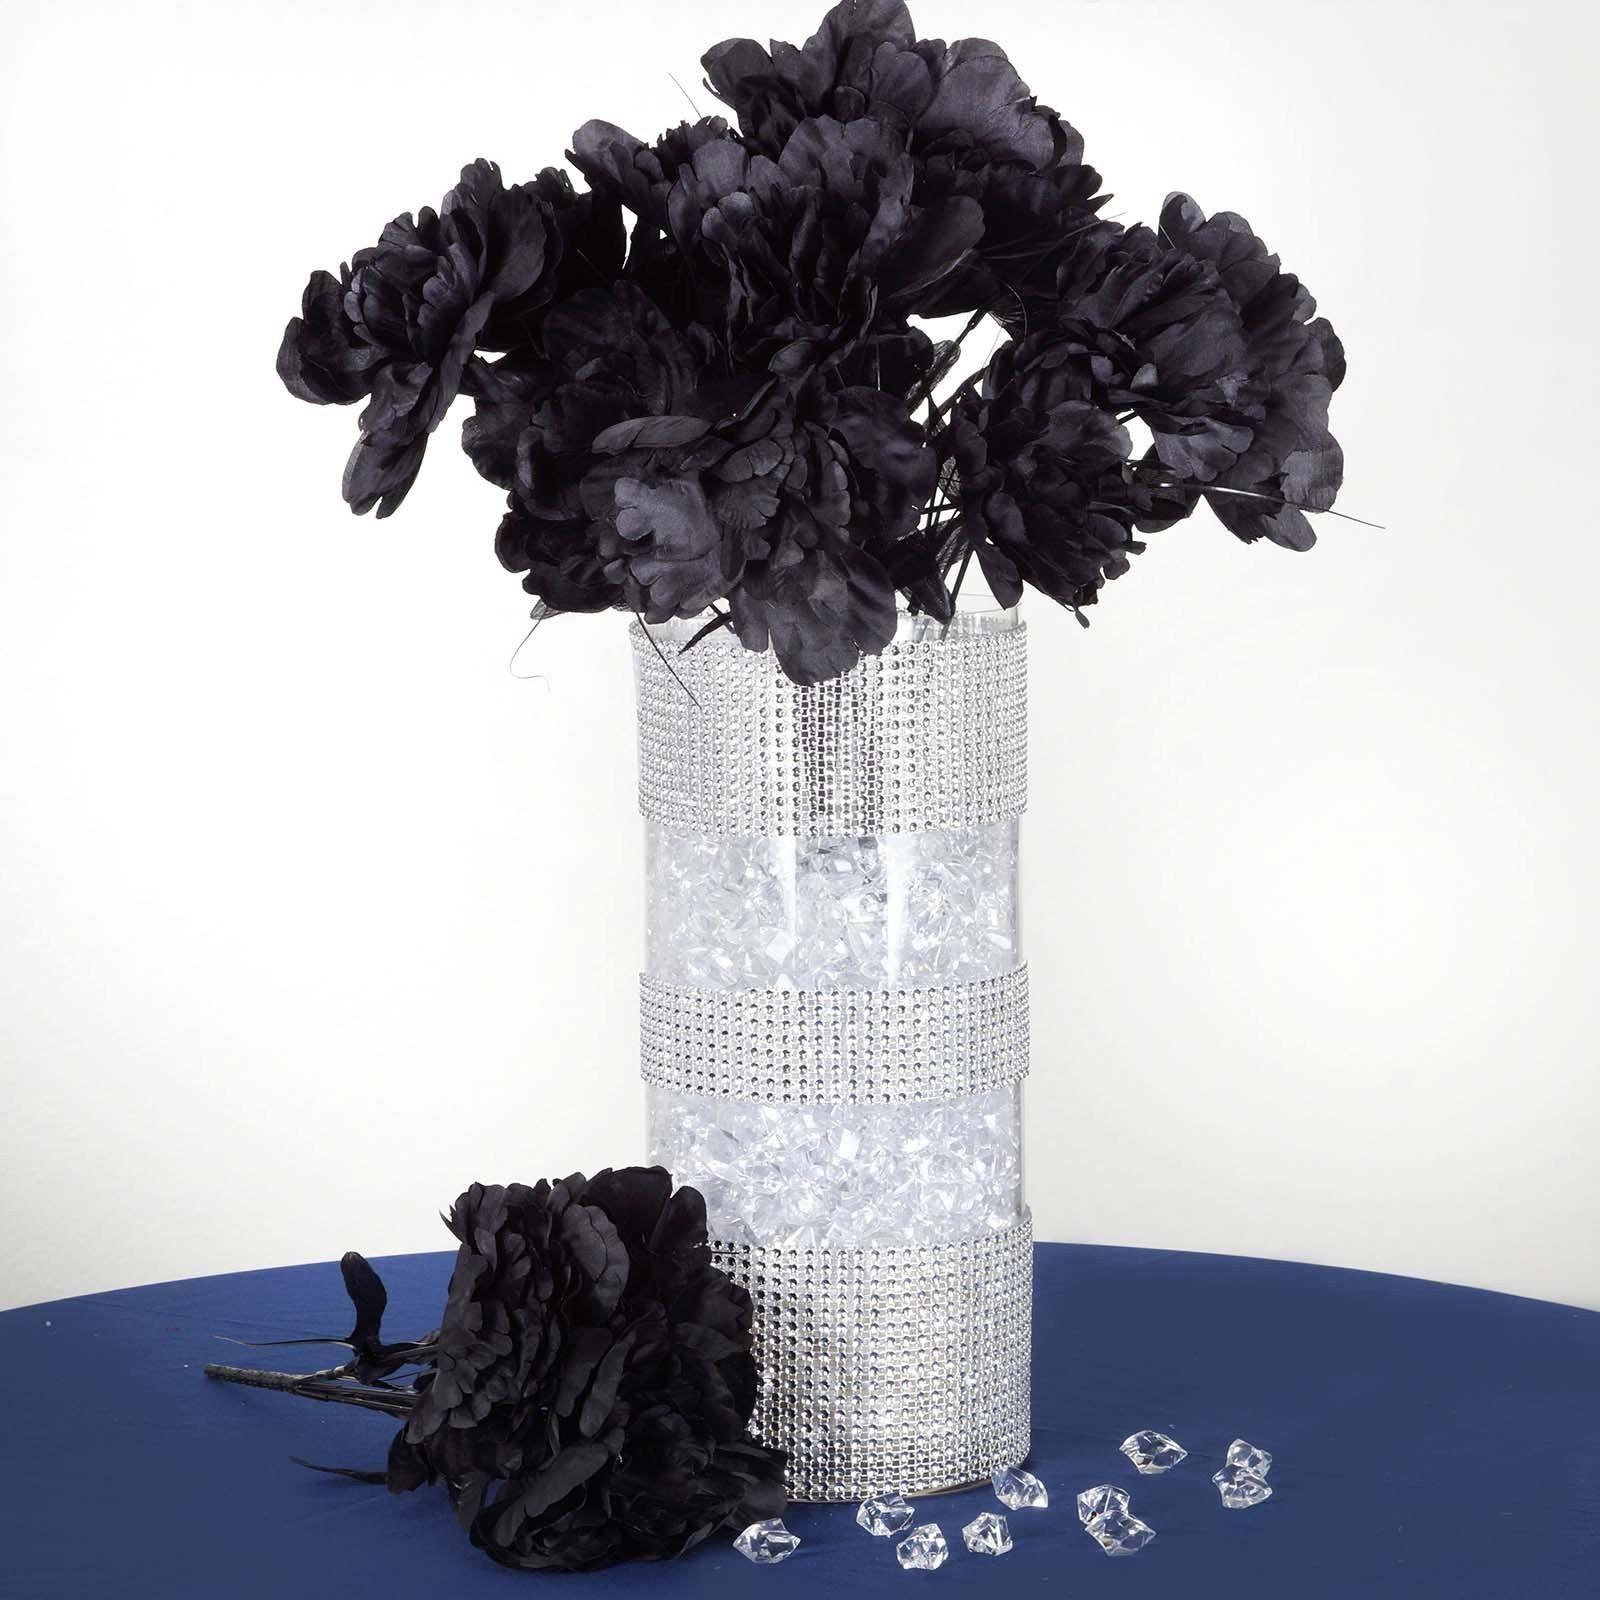 60 artificial bridal bouquet peony silk flowers home party decor 60 artificial bridal bouquet peony silk flowers home party decor black mightylinksfo